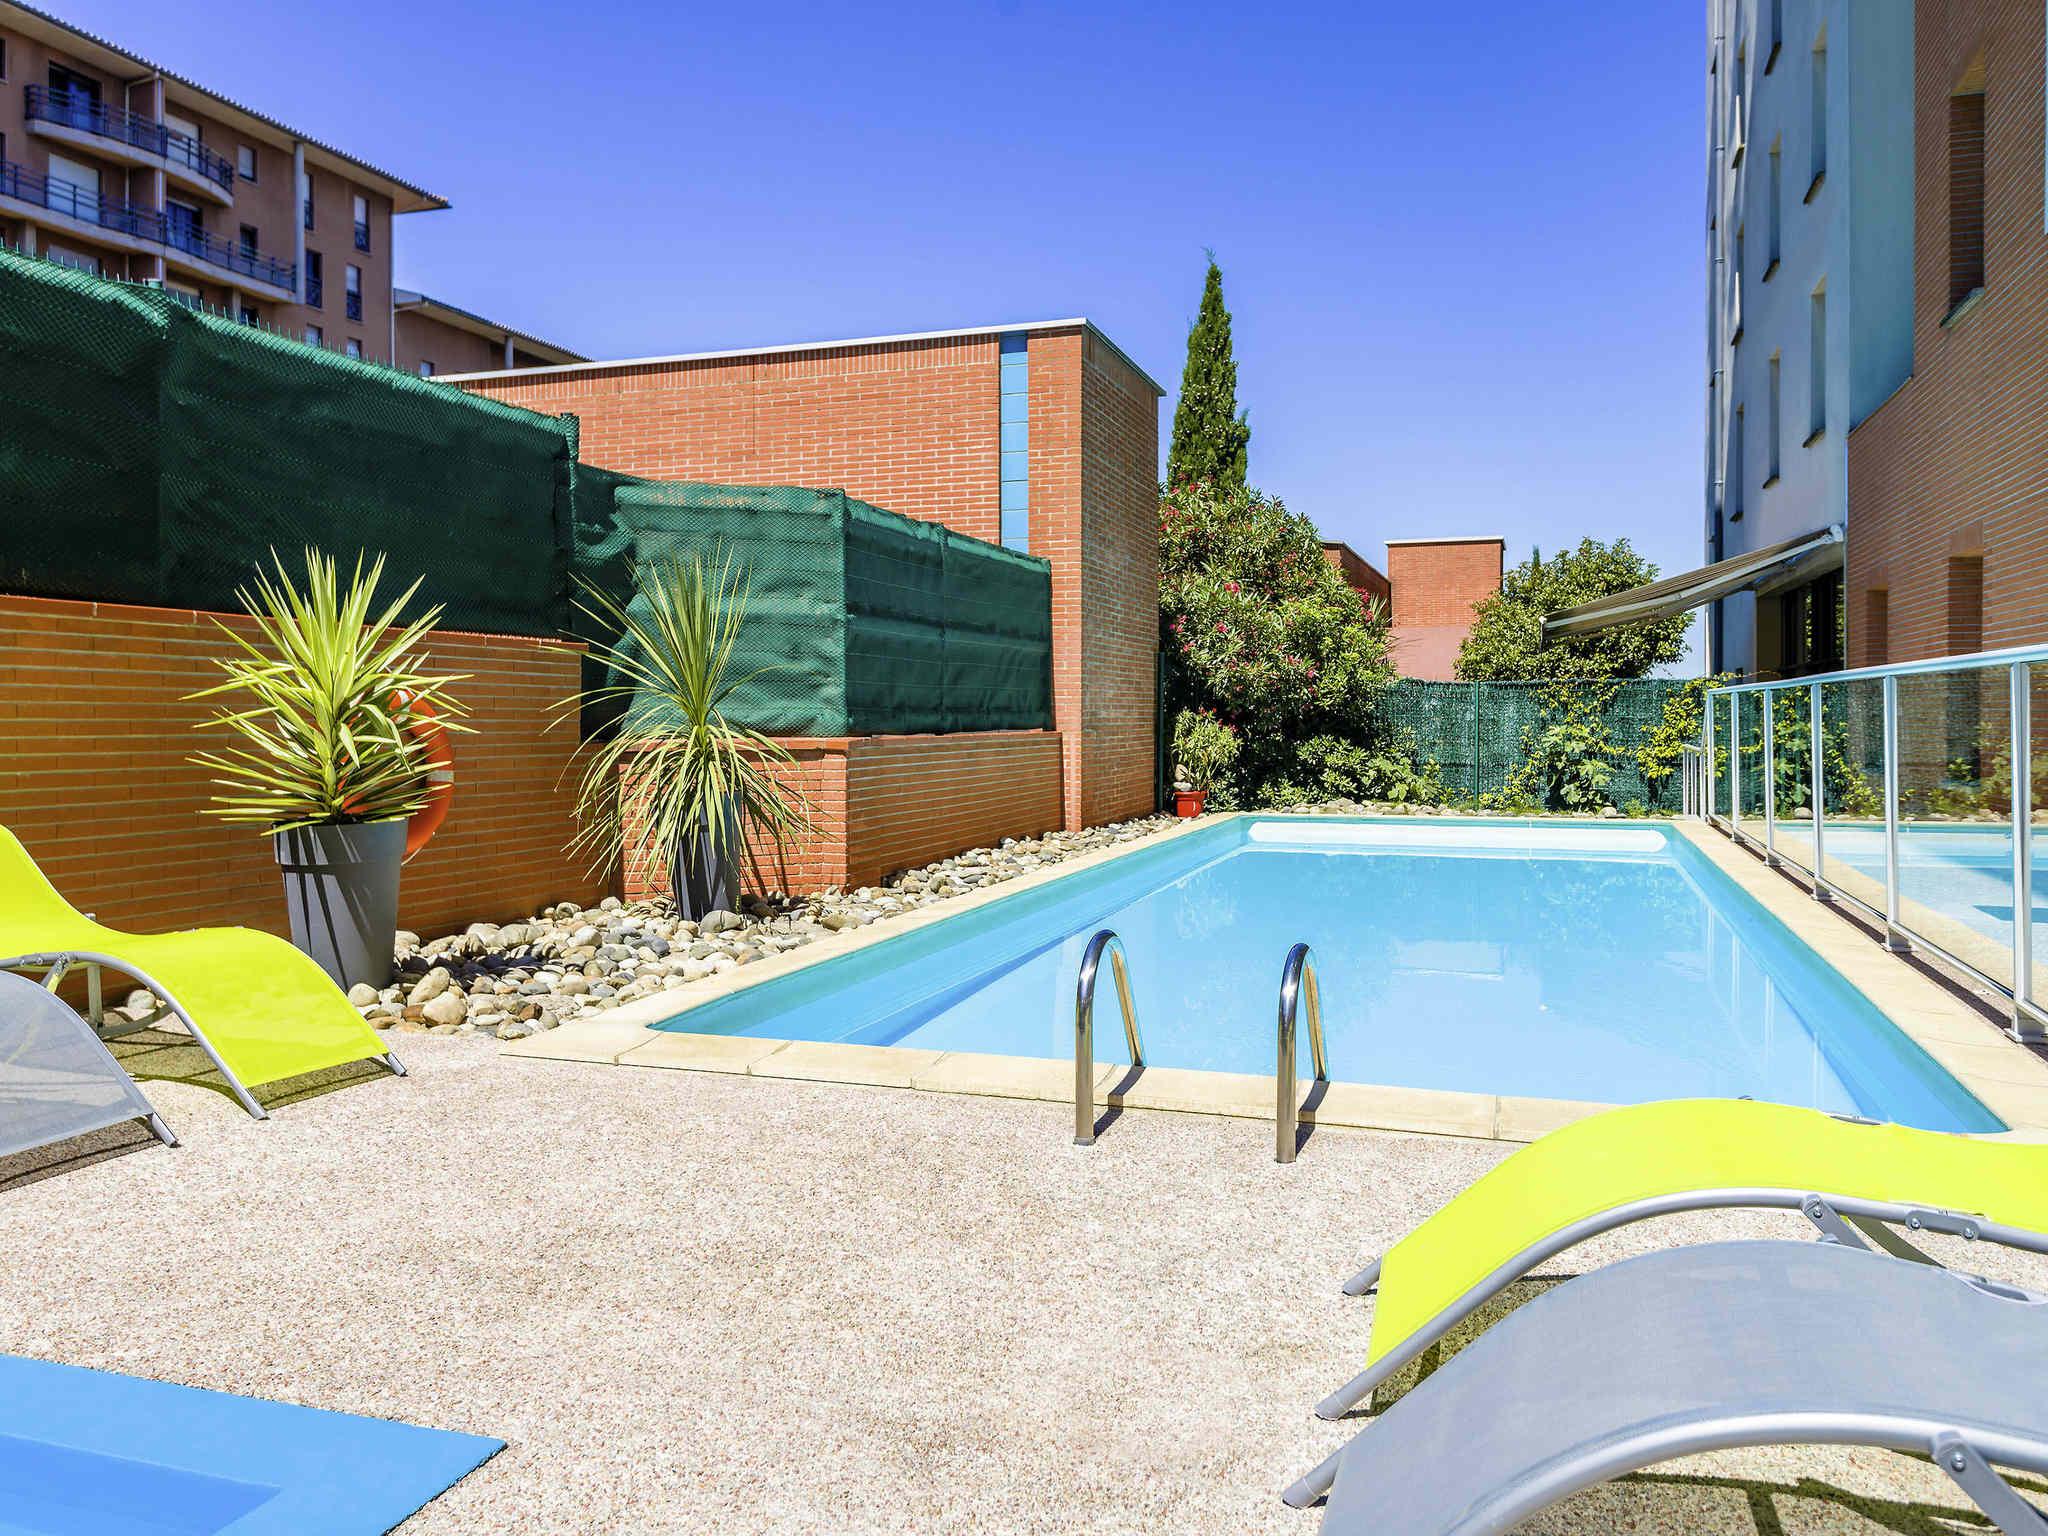 Hotell – Aparthotel Adagio access Toulouse Jolimont